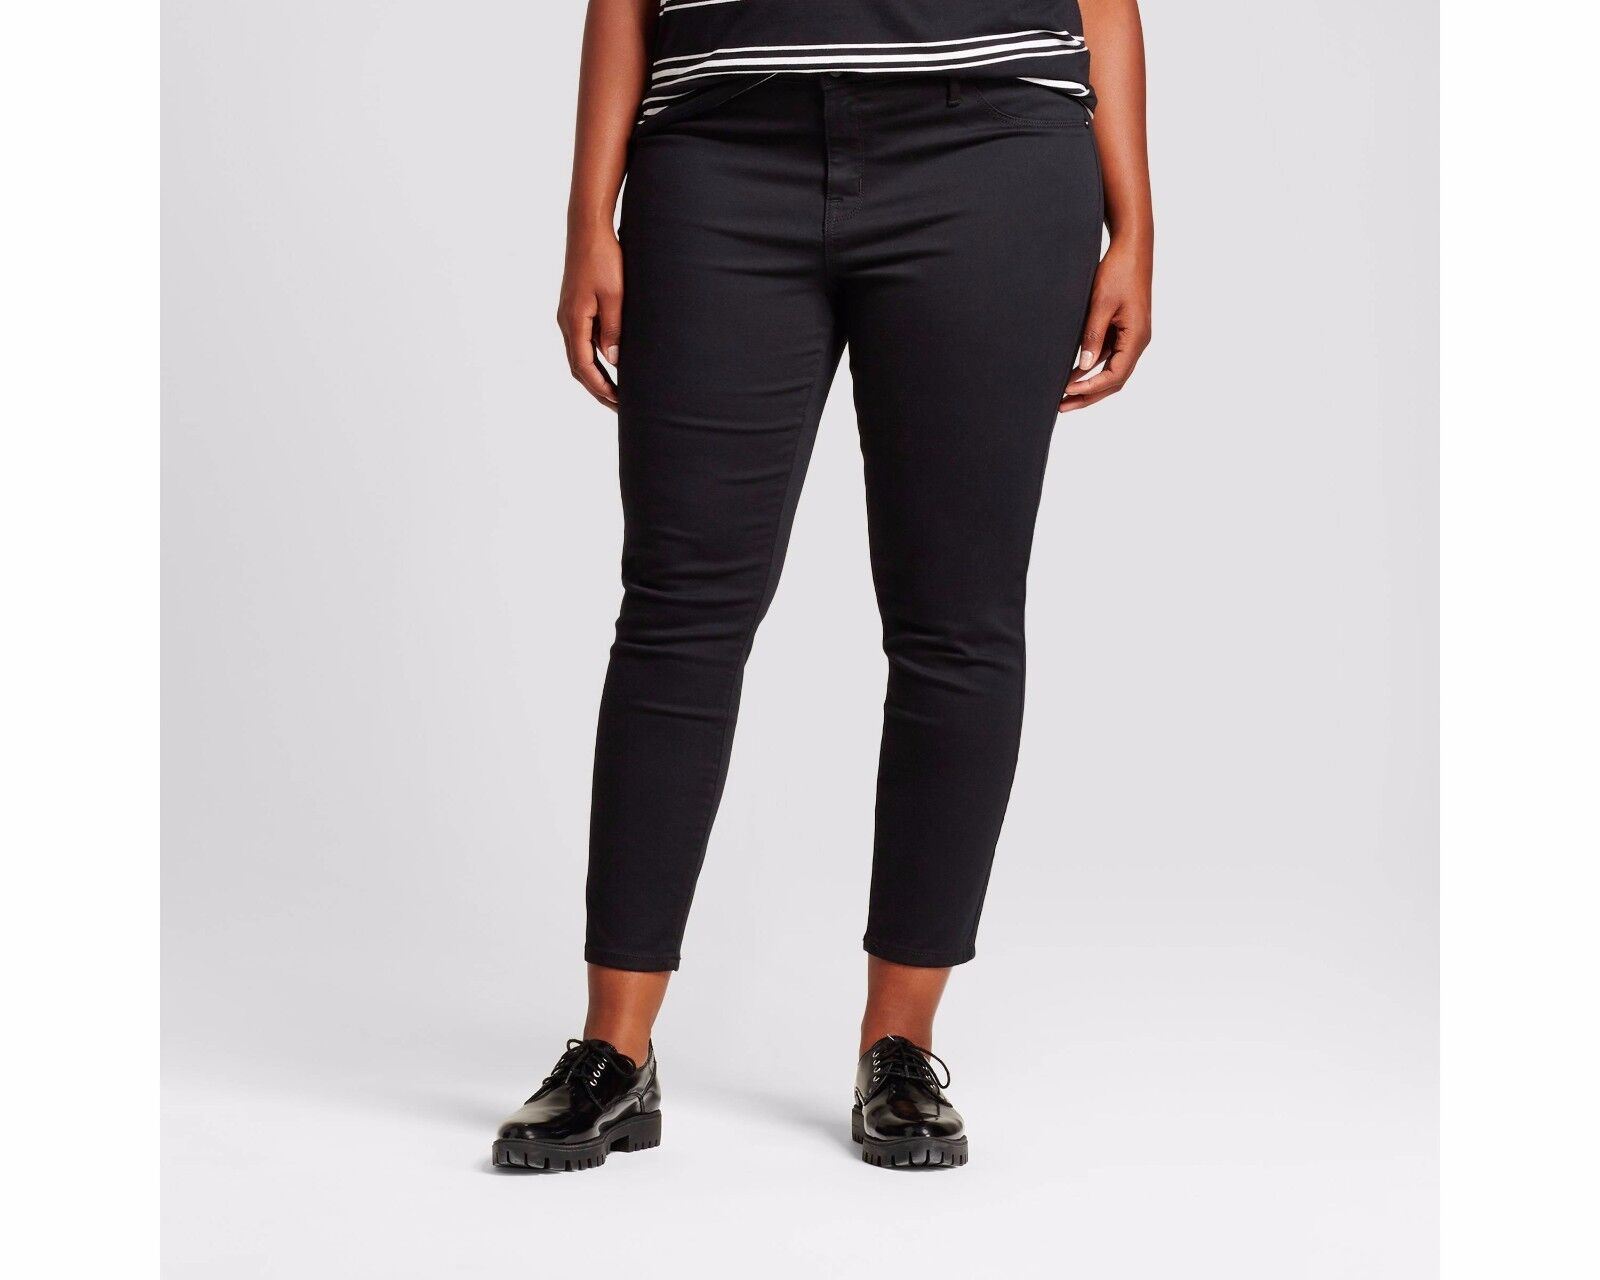 e497e5a39d650 NWT Women s Plus Size Denim Jeggings - Ava   Viv Black size 26W ...